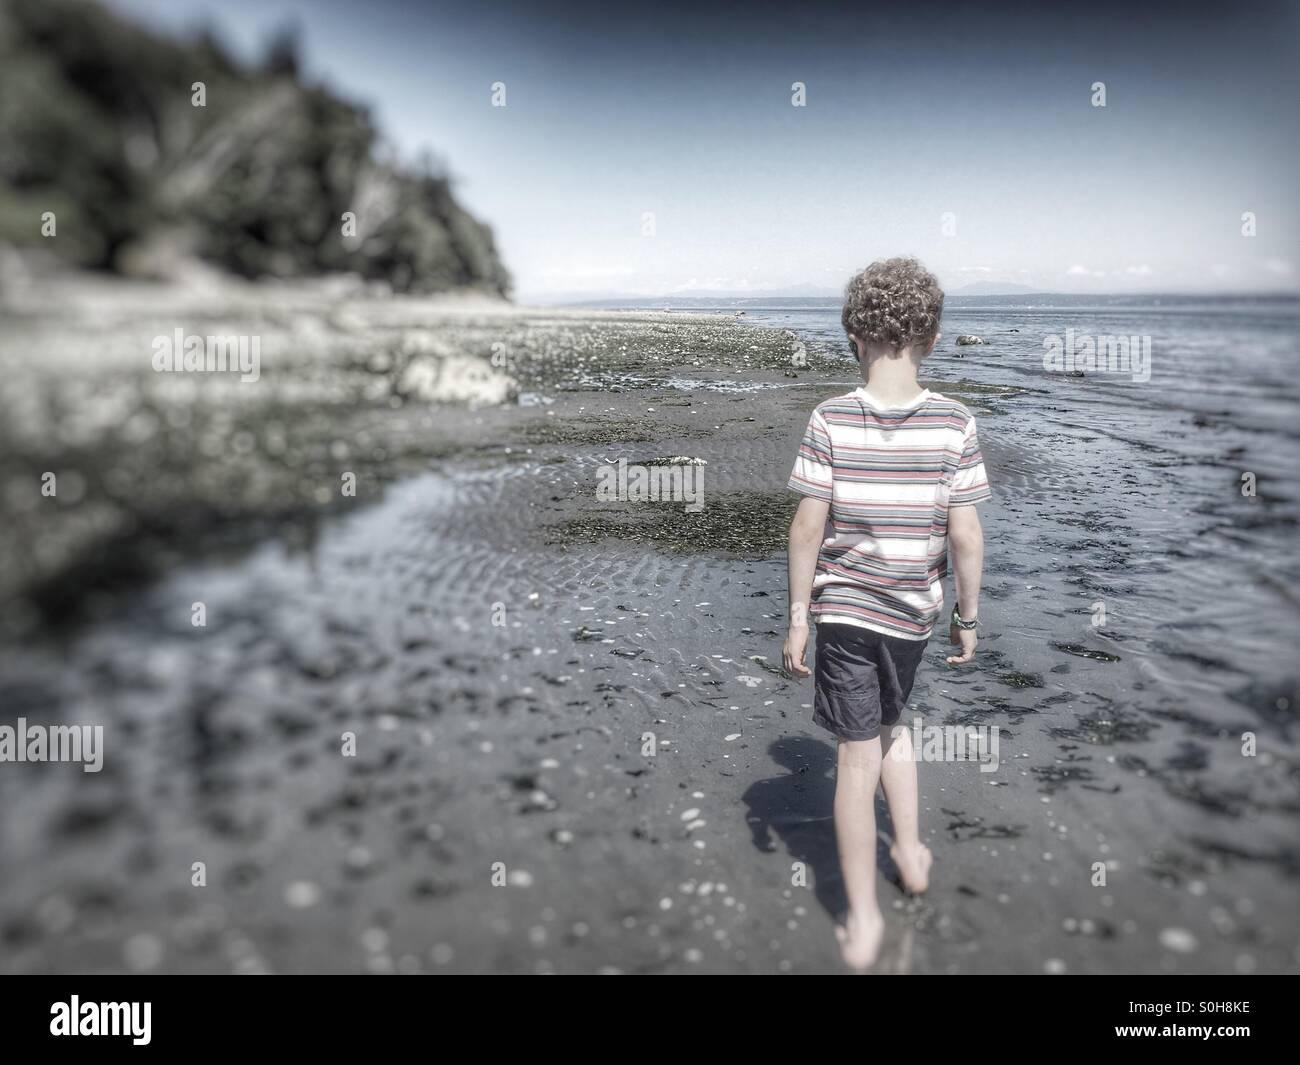 Walking the beach in Kingston, Washington, USA - Stock Image